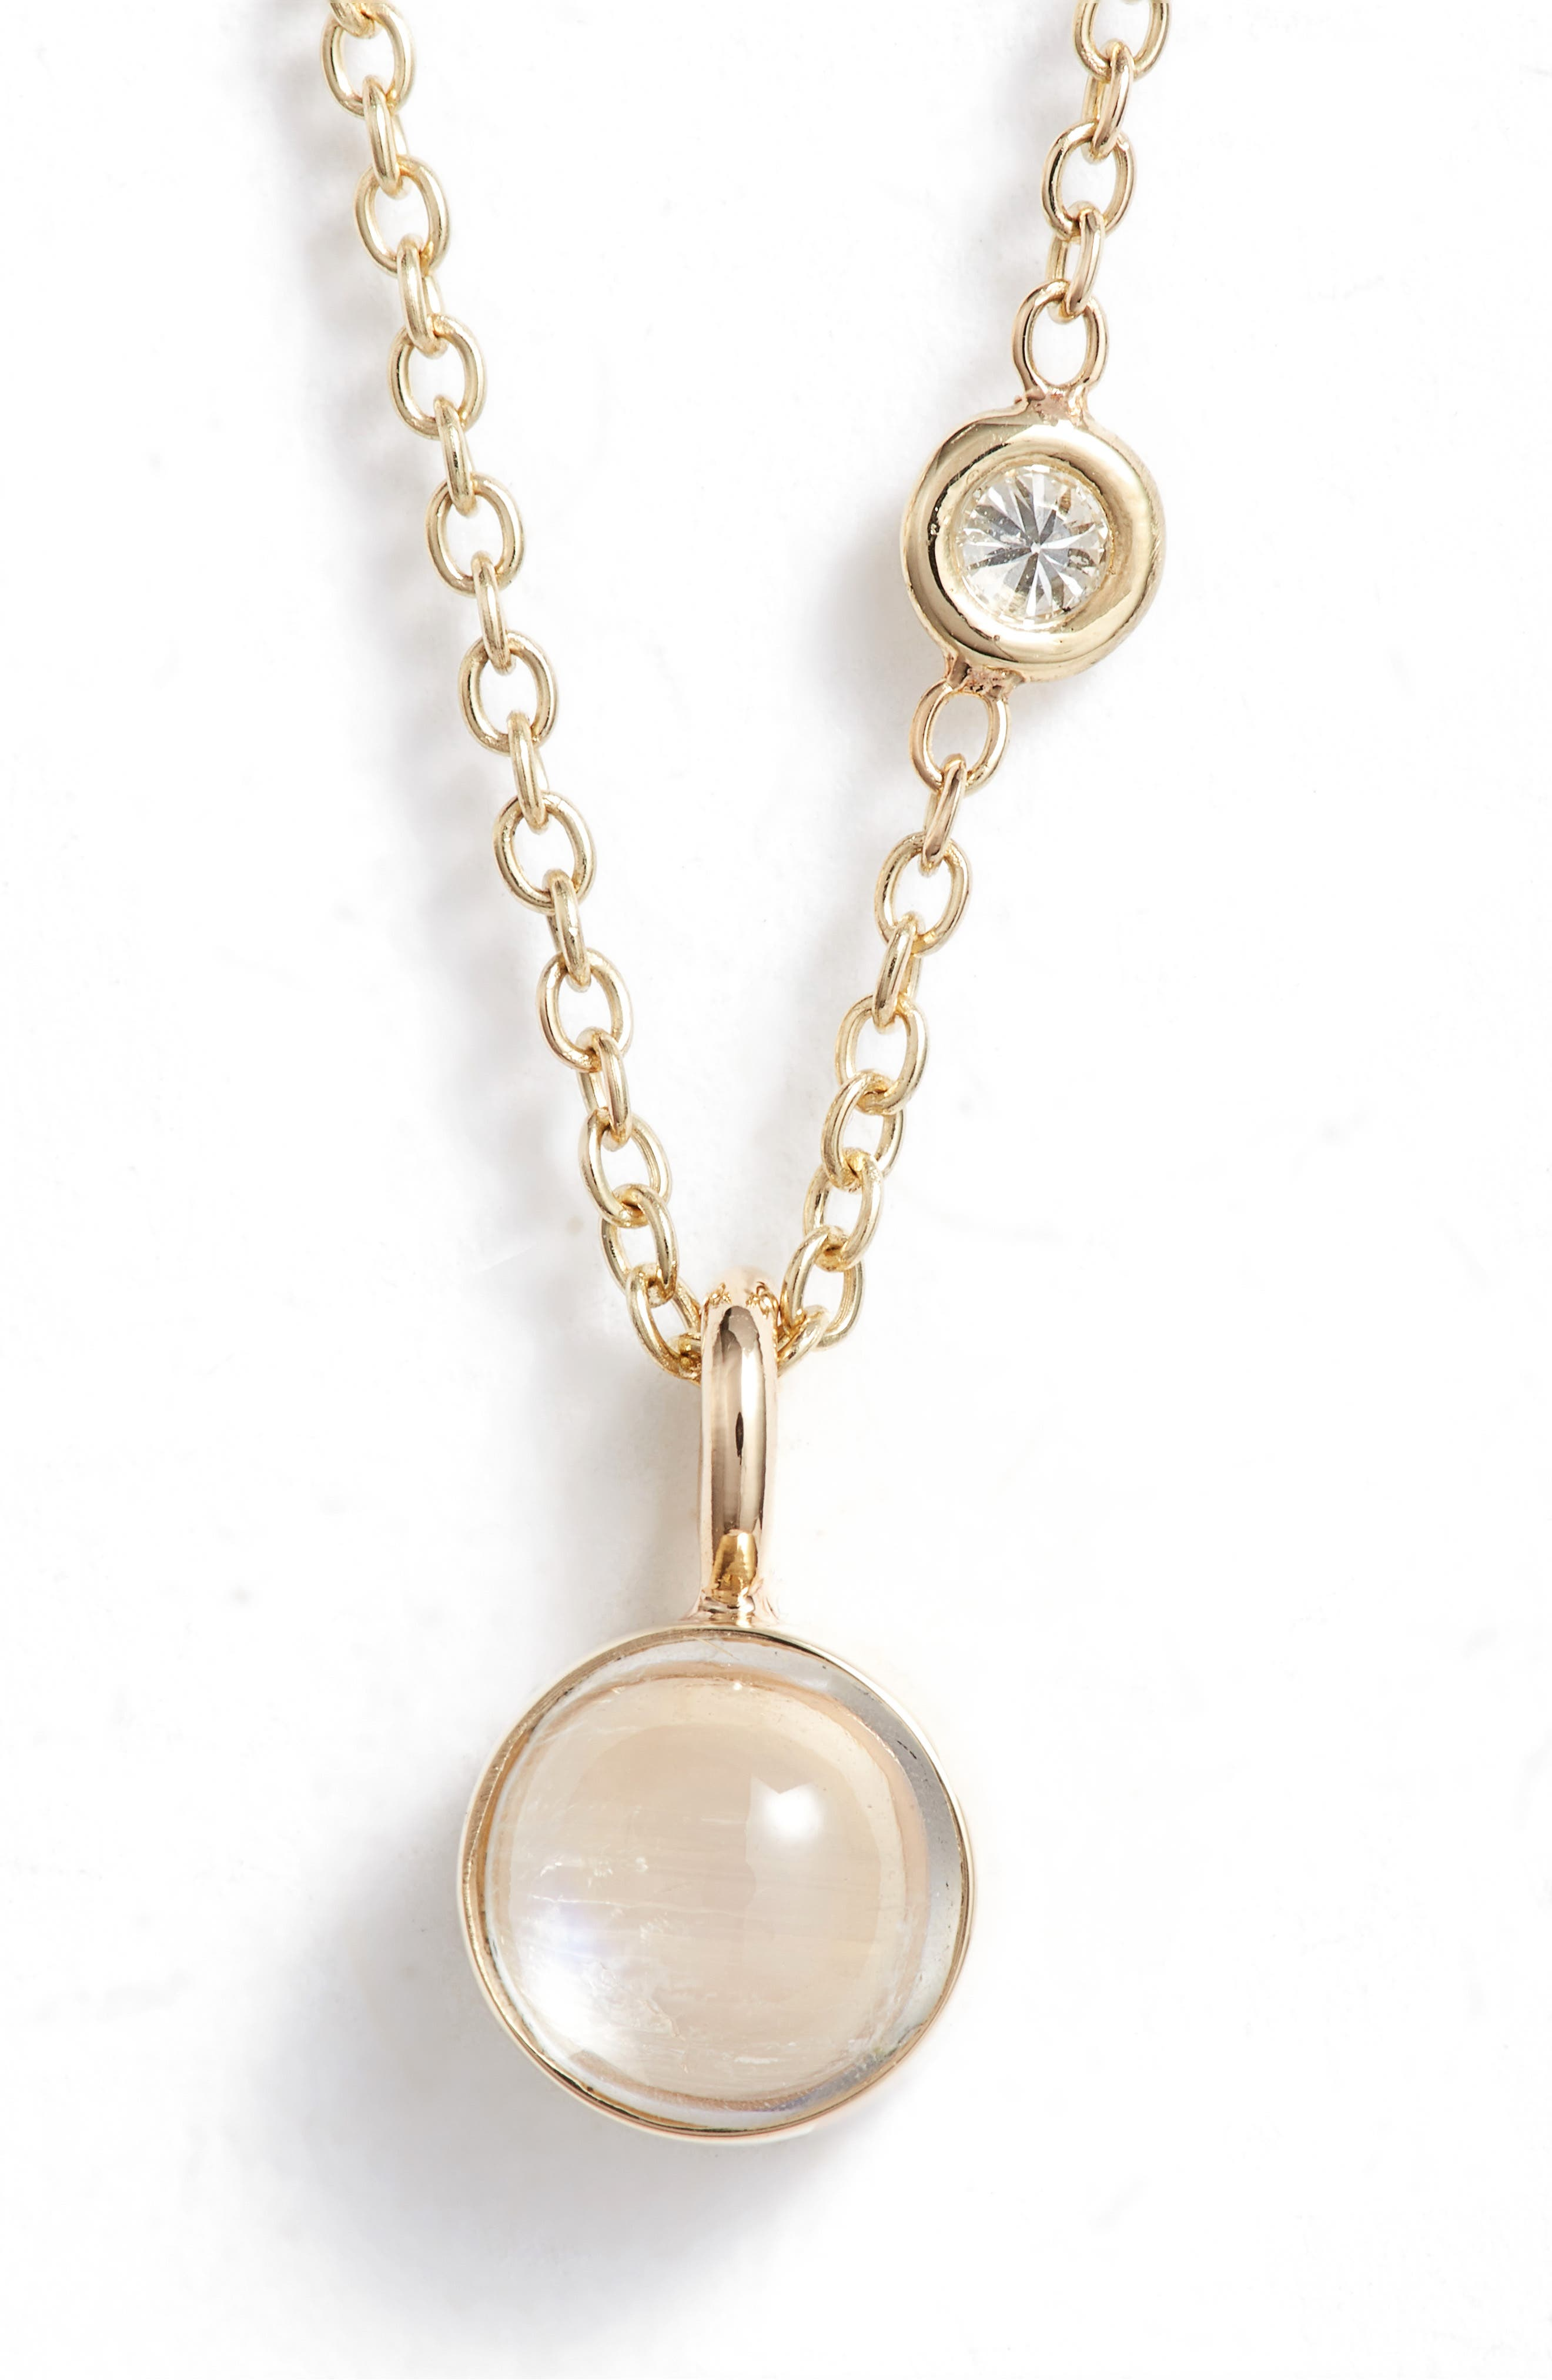 Moonstone & Diamond Pendant Necklace,                         Main,                         color, Yellow Gold/ Moonstone